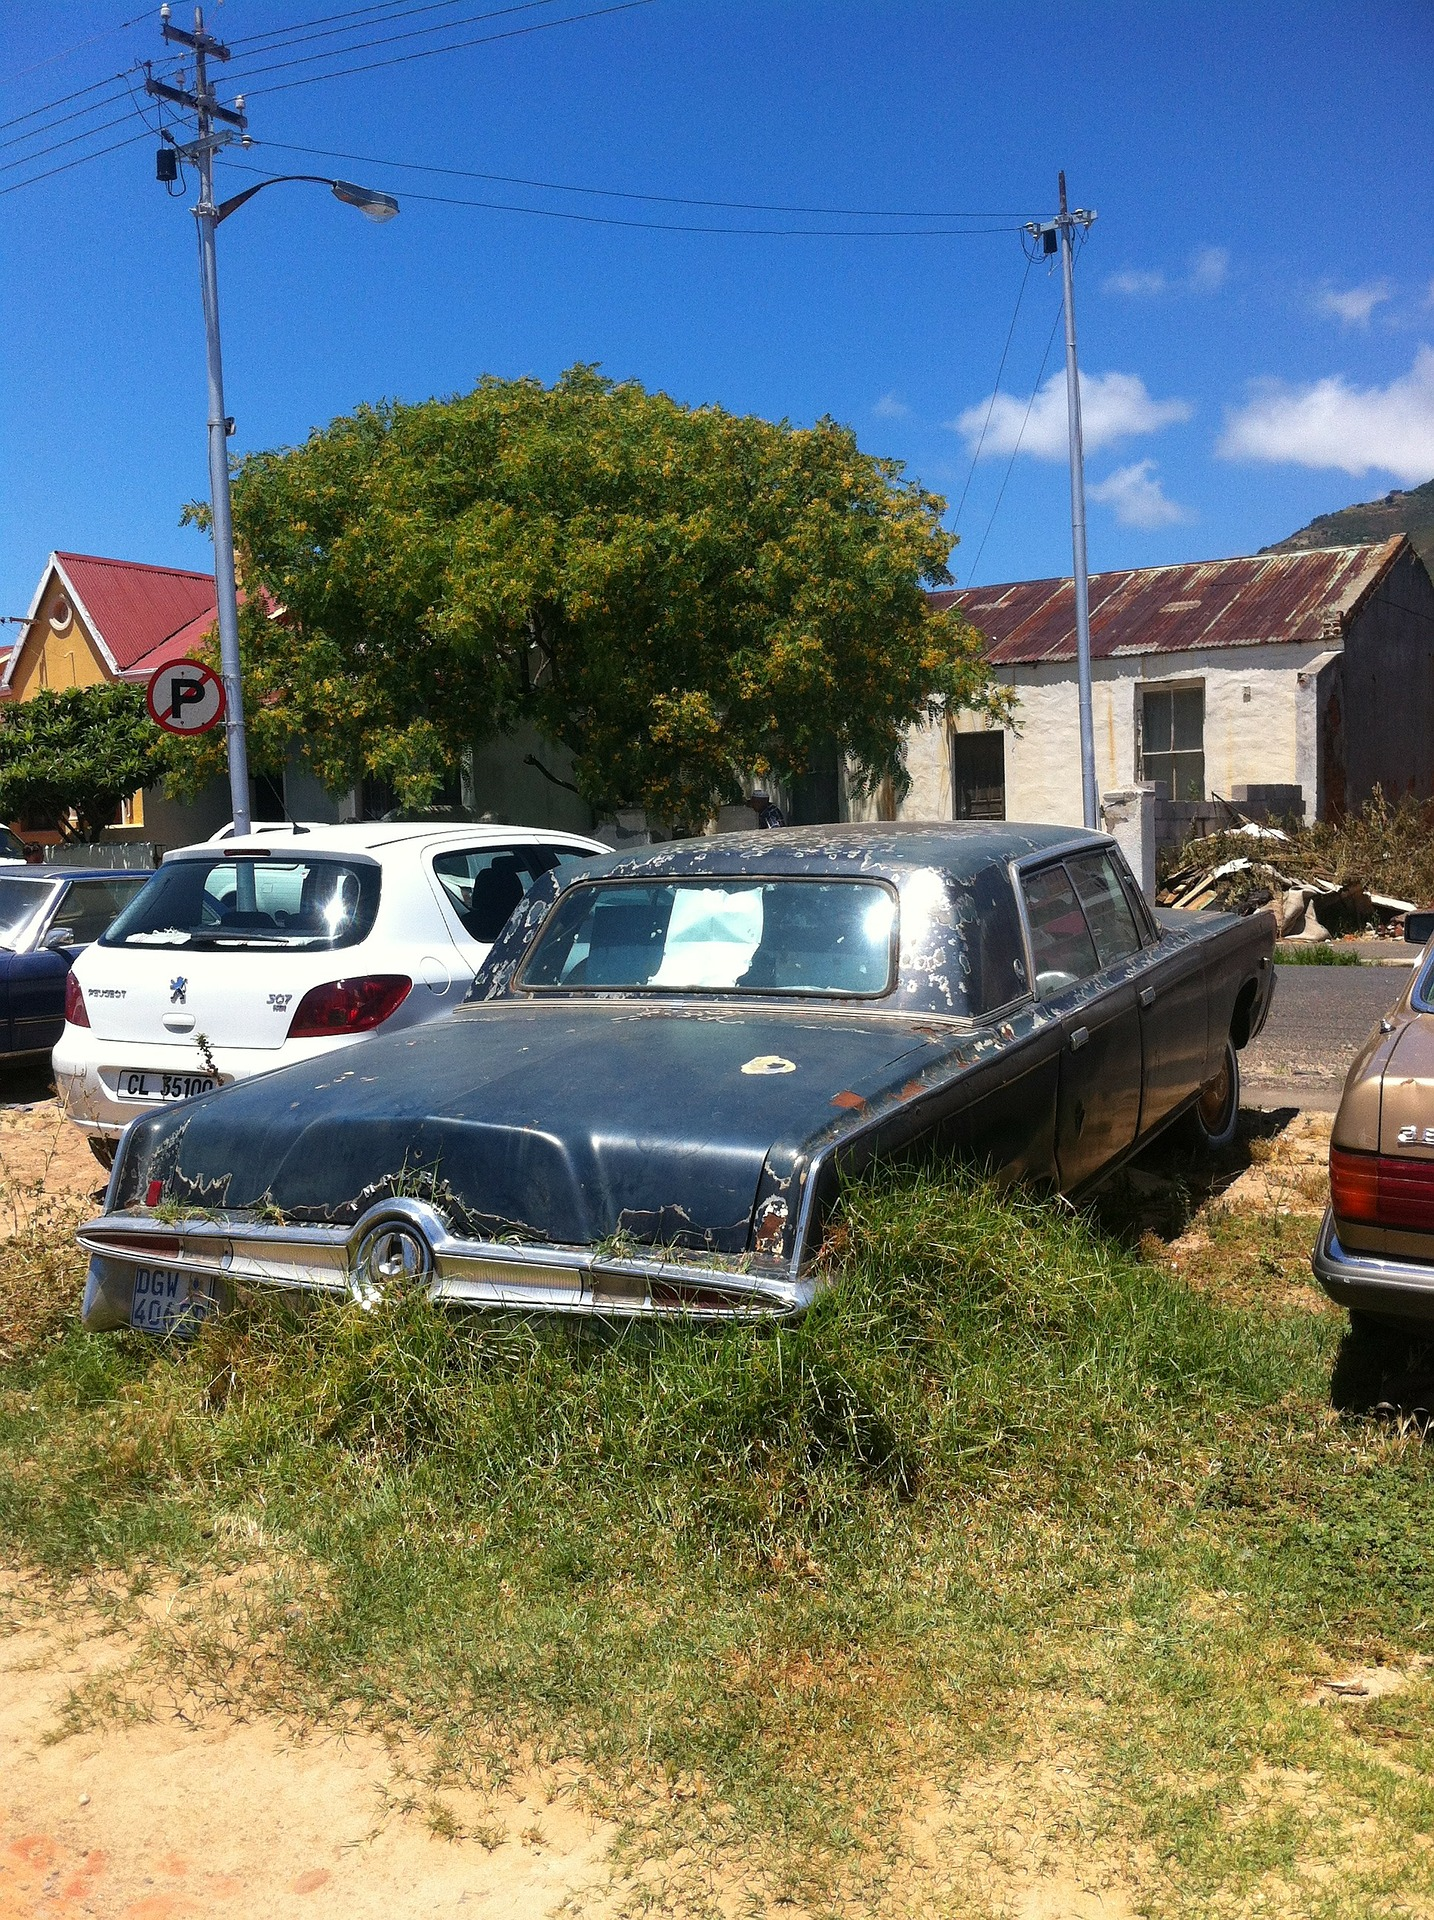 Cars for Scrap near Swampscott MA